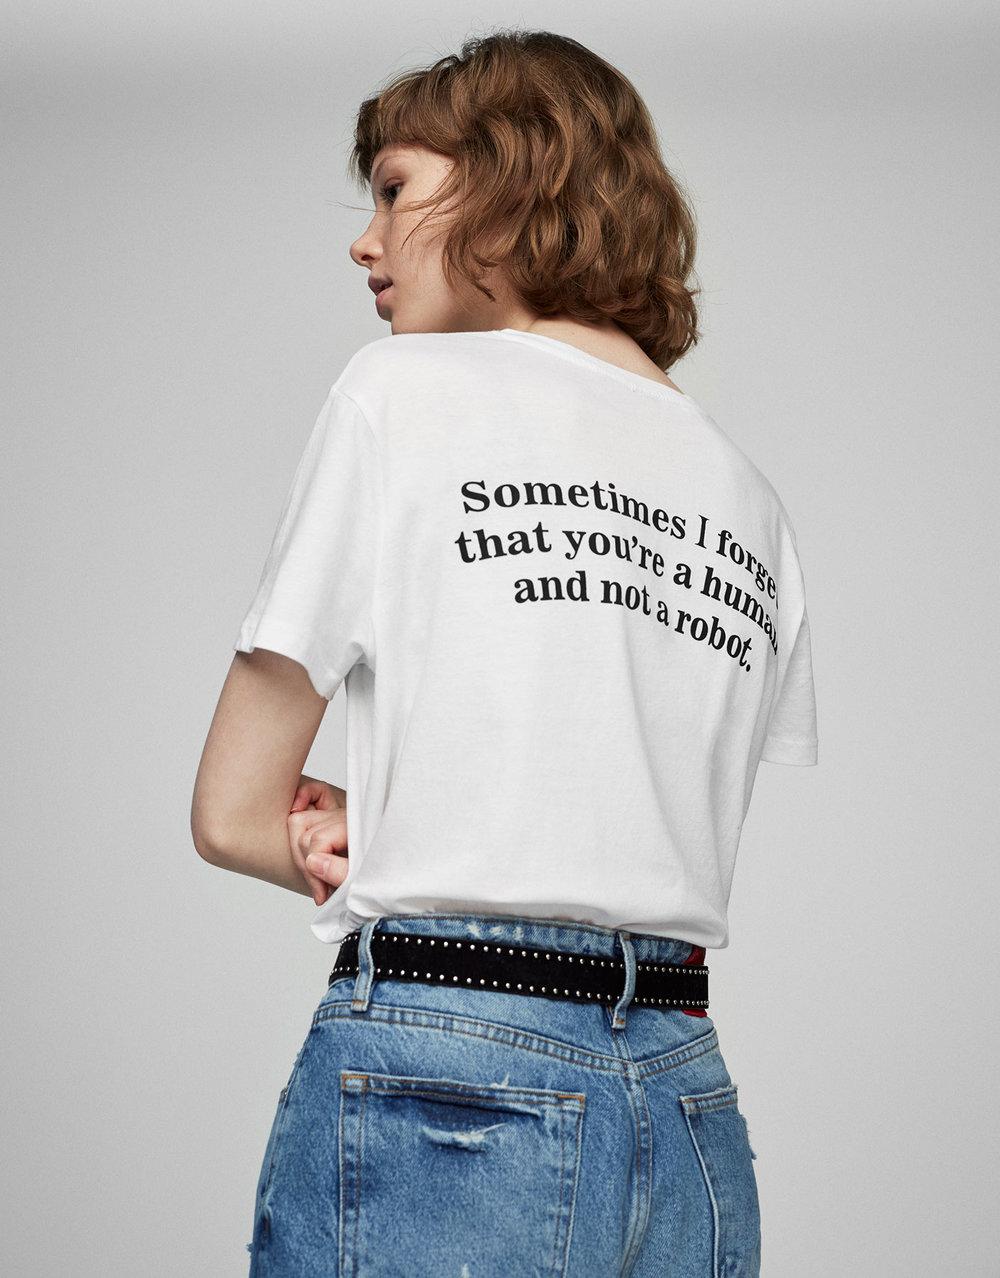 T-shirt-estampada-costas-599€.jpg